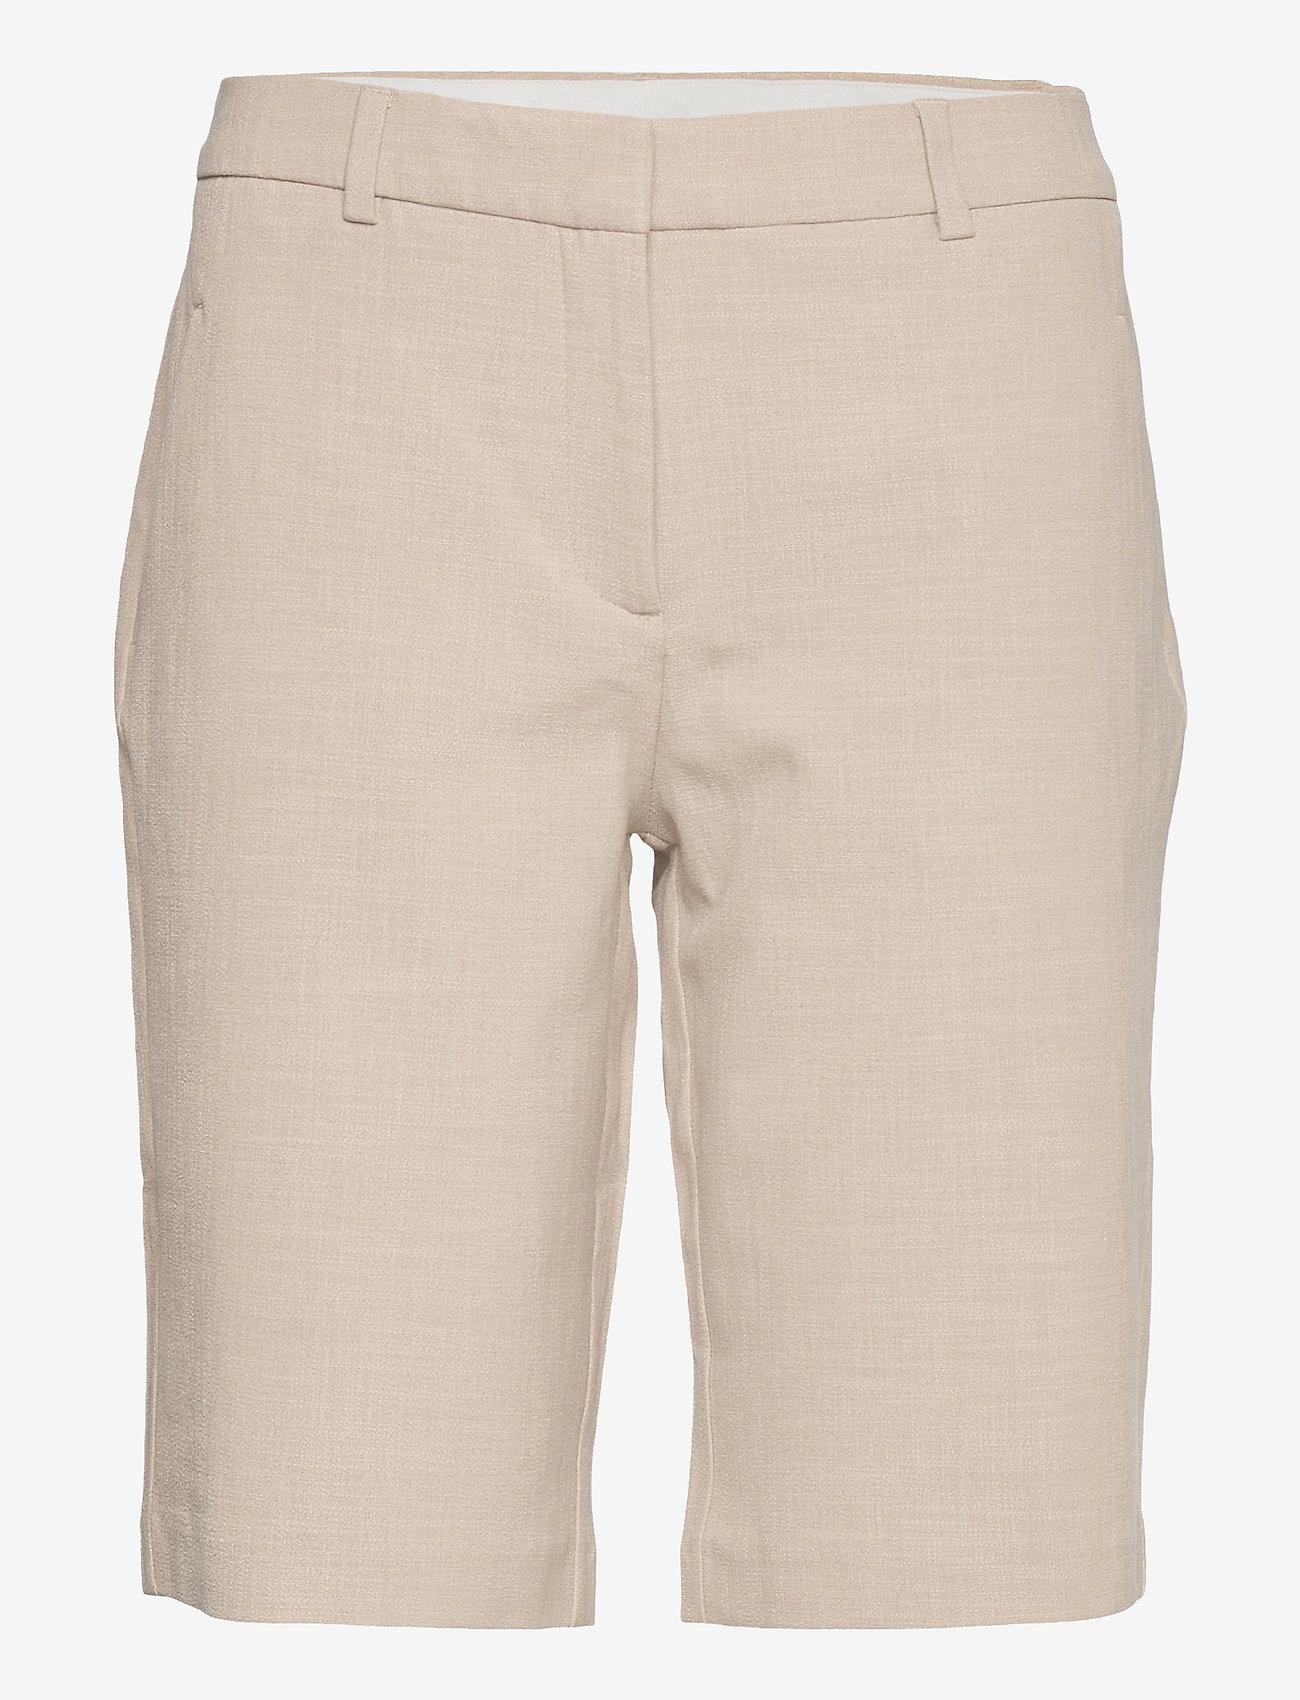 FIVEUNITS - Kylie Shorts 396 - chino shorts - plaza melange - 1